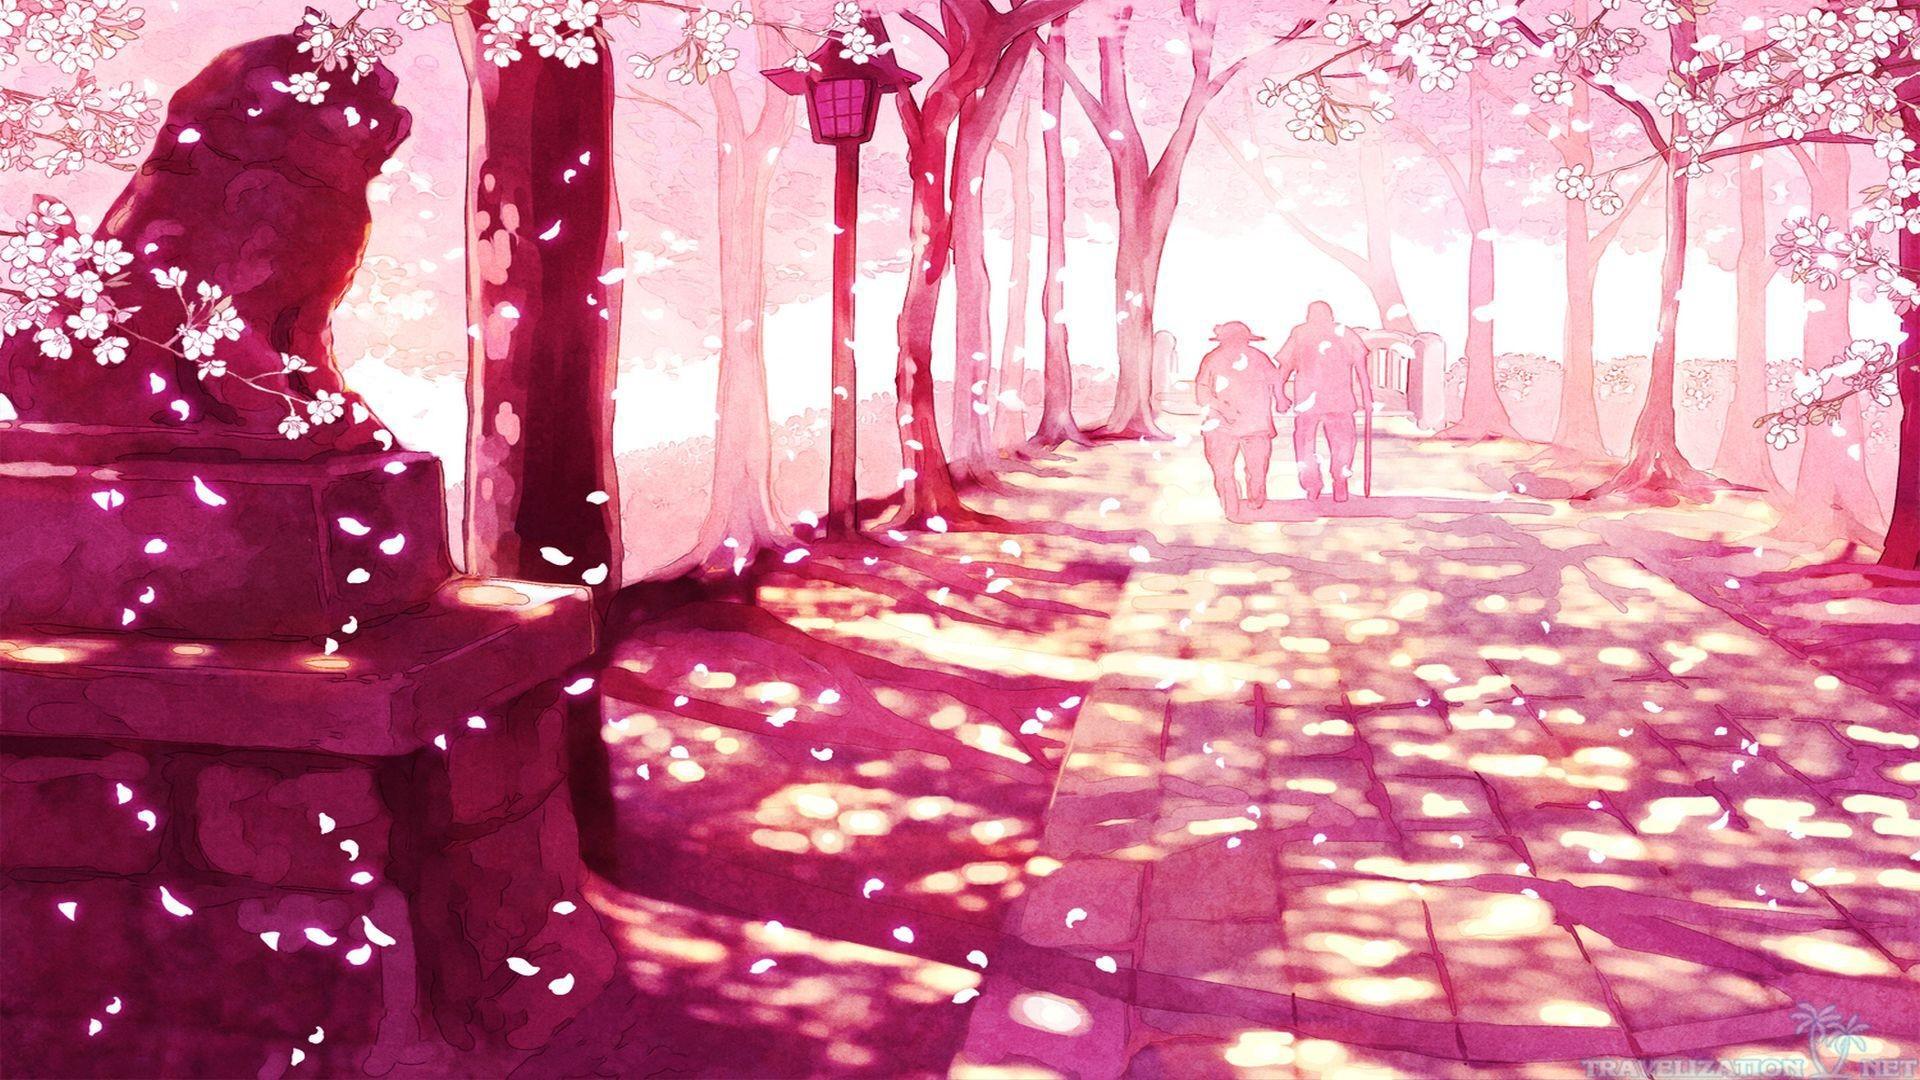 Sakura Cherry Blossom HD desktop wallpaper High Definition